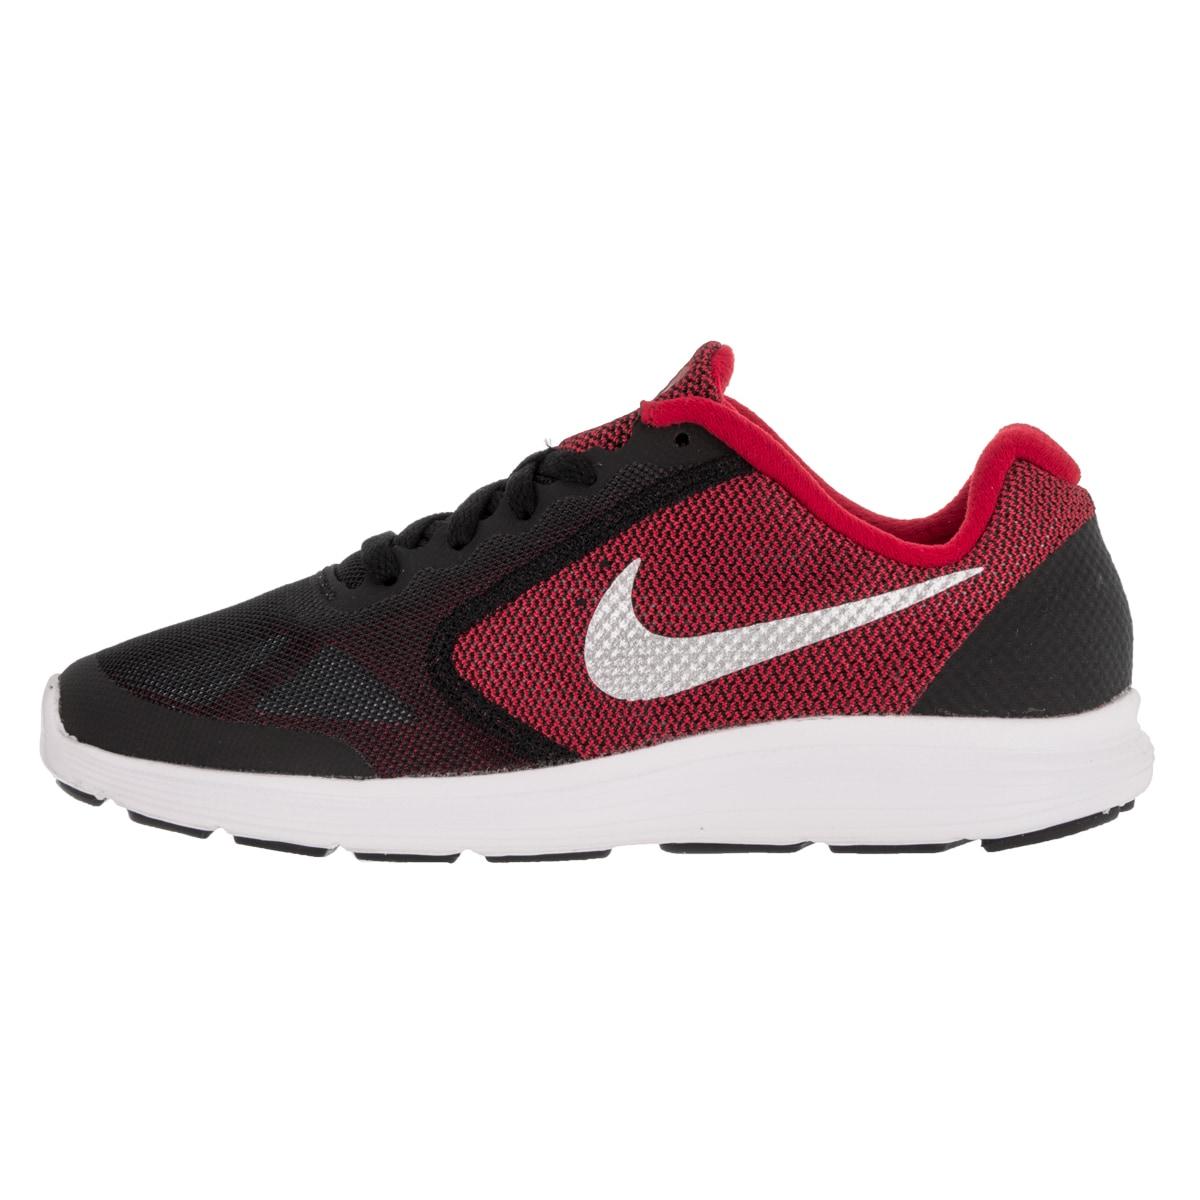 8c99c59d2502 Shop Nike Kid s Revolution 3 (Gs) University Red Metallic Silver Black White  Running Shoe - Free Shipping Today - Overstock - 12324091